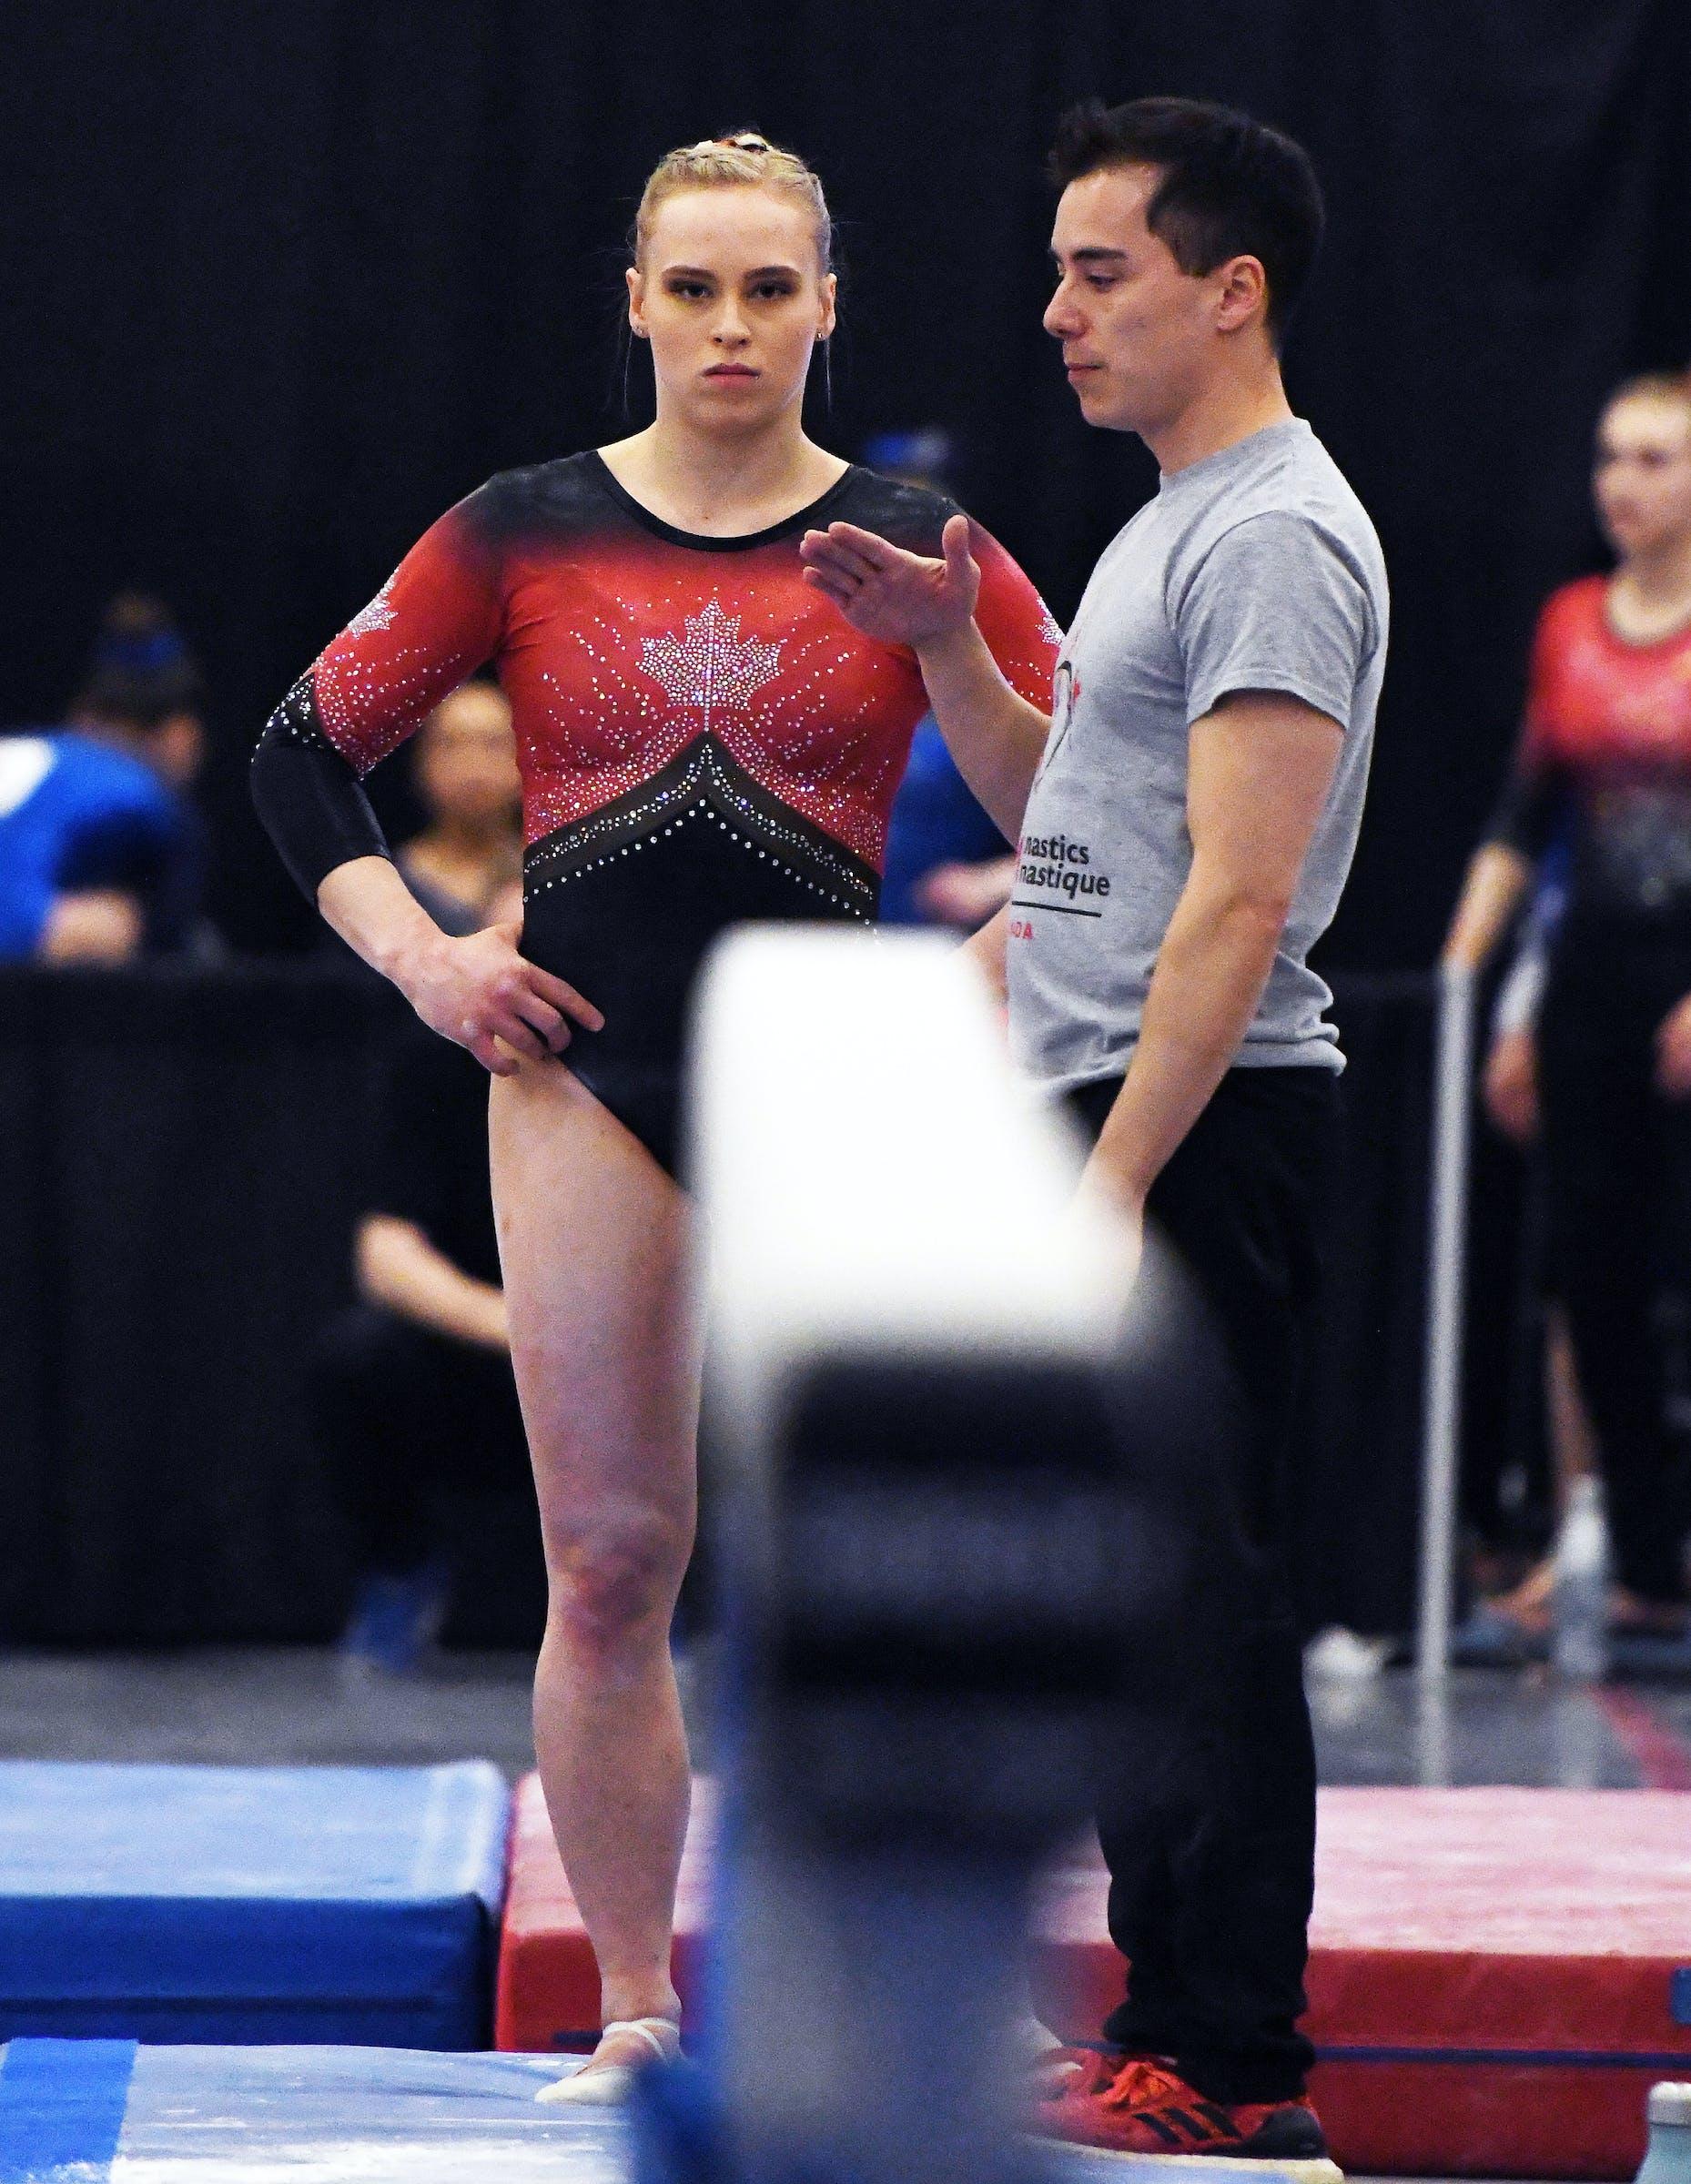 Ellie Black focuses as coach David Kikuchi gives instruction at the 2019 Artistic Gymnastics Canadian Championships in Ottawa. - Gymnastics Canada